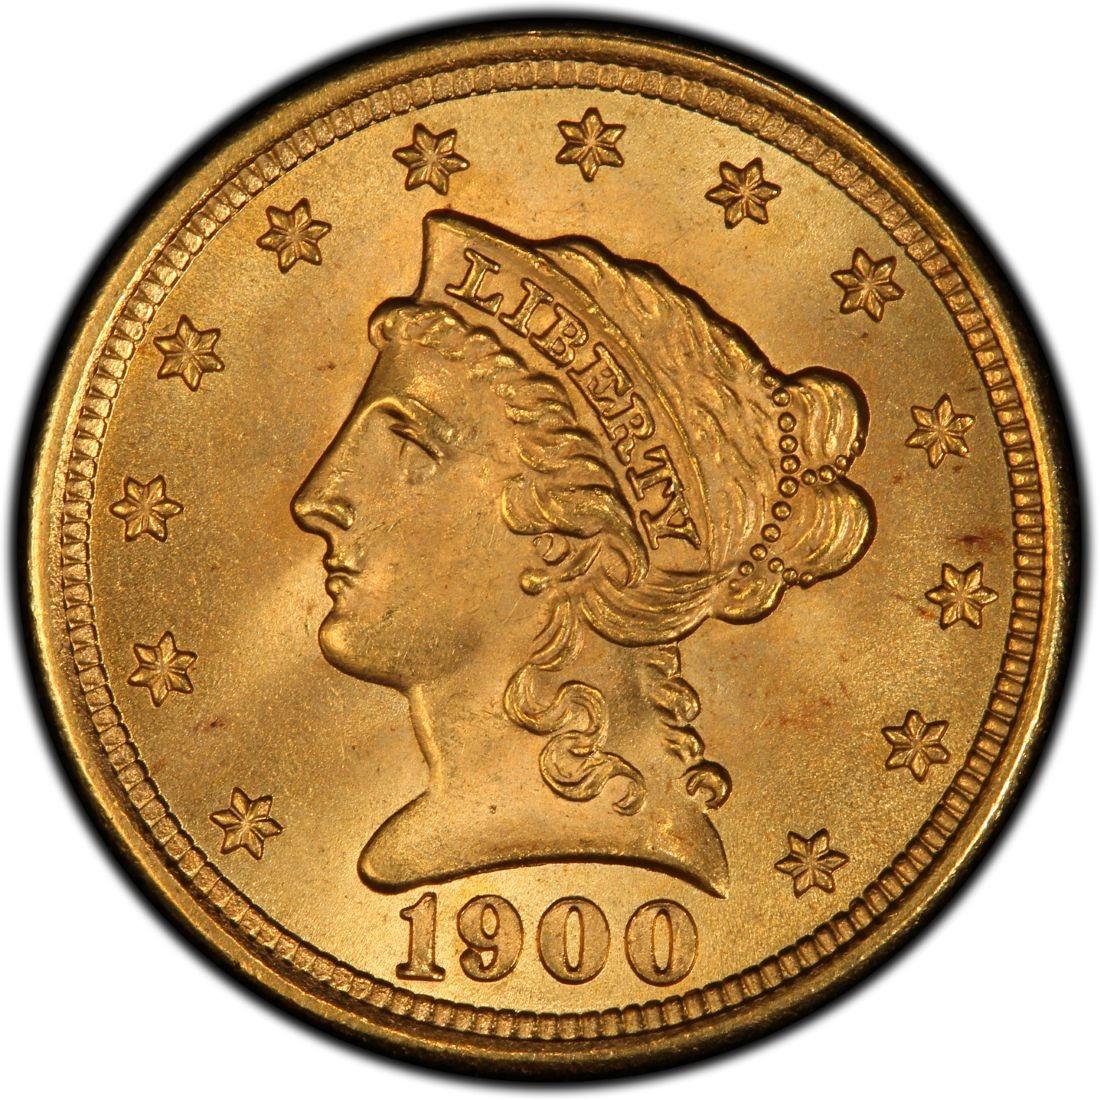 1900 Liberty Head 2 50 Gold Quarter Eagle Coin Values And